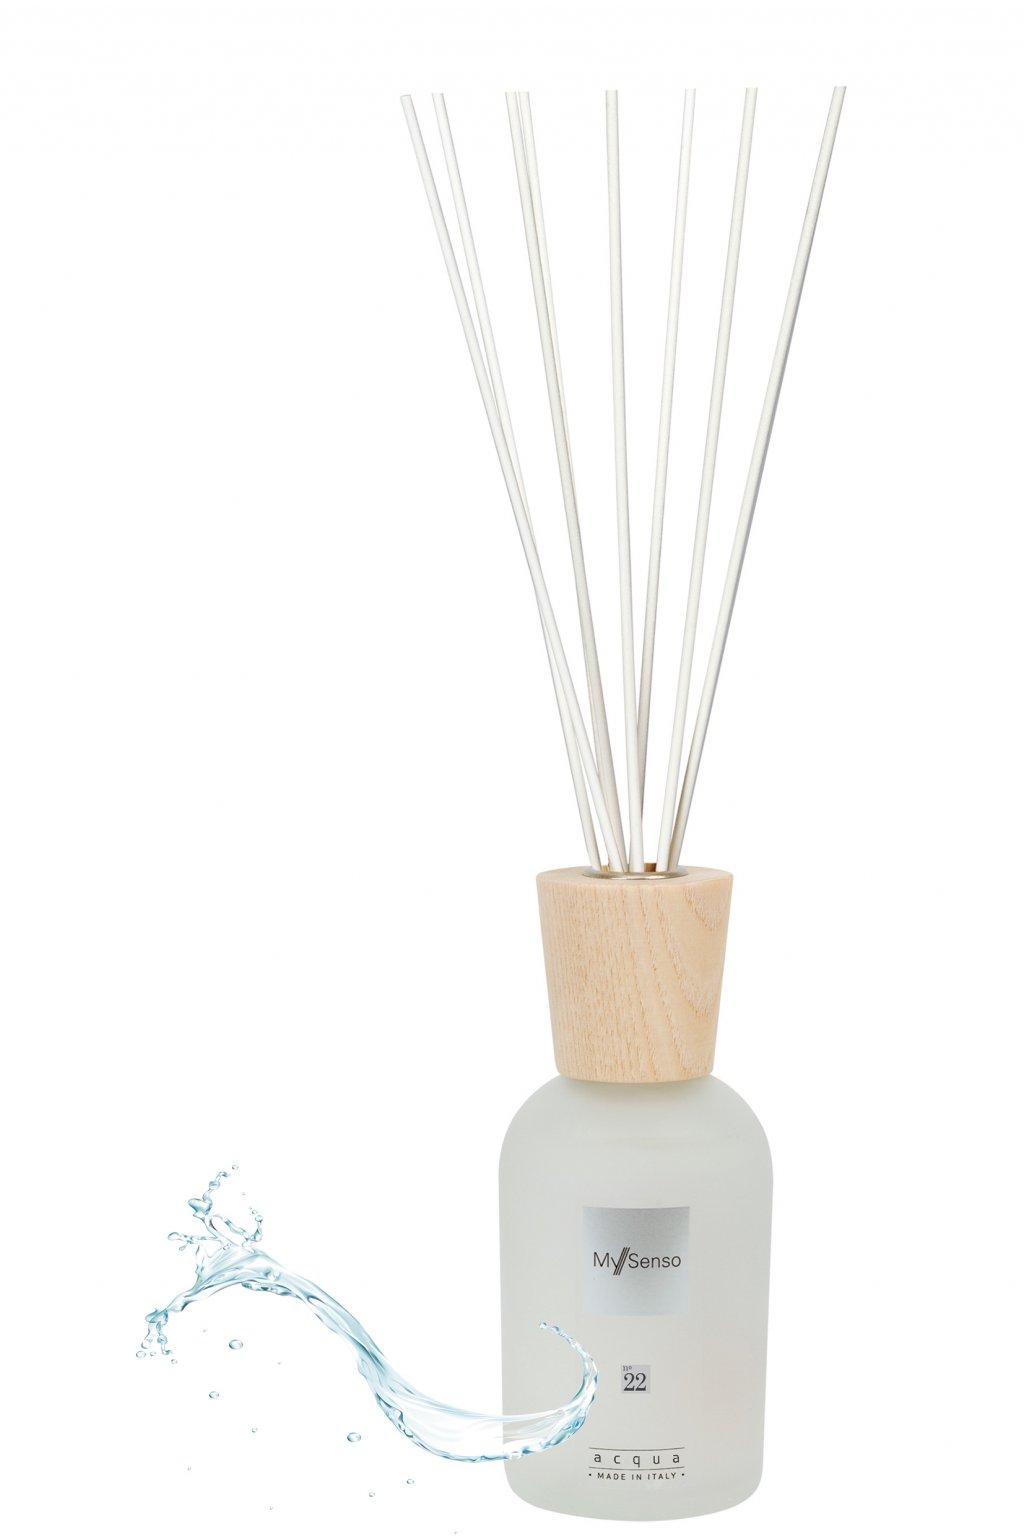 132 my senso aromaticky difuzer premium n 22 acqua 240ml vune more